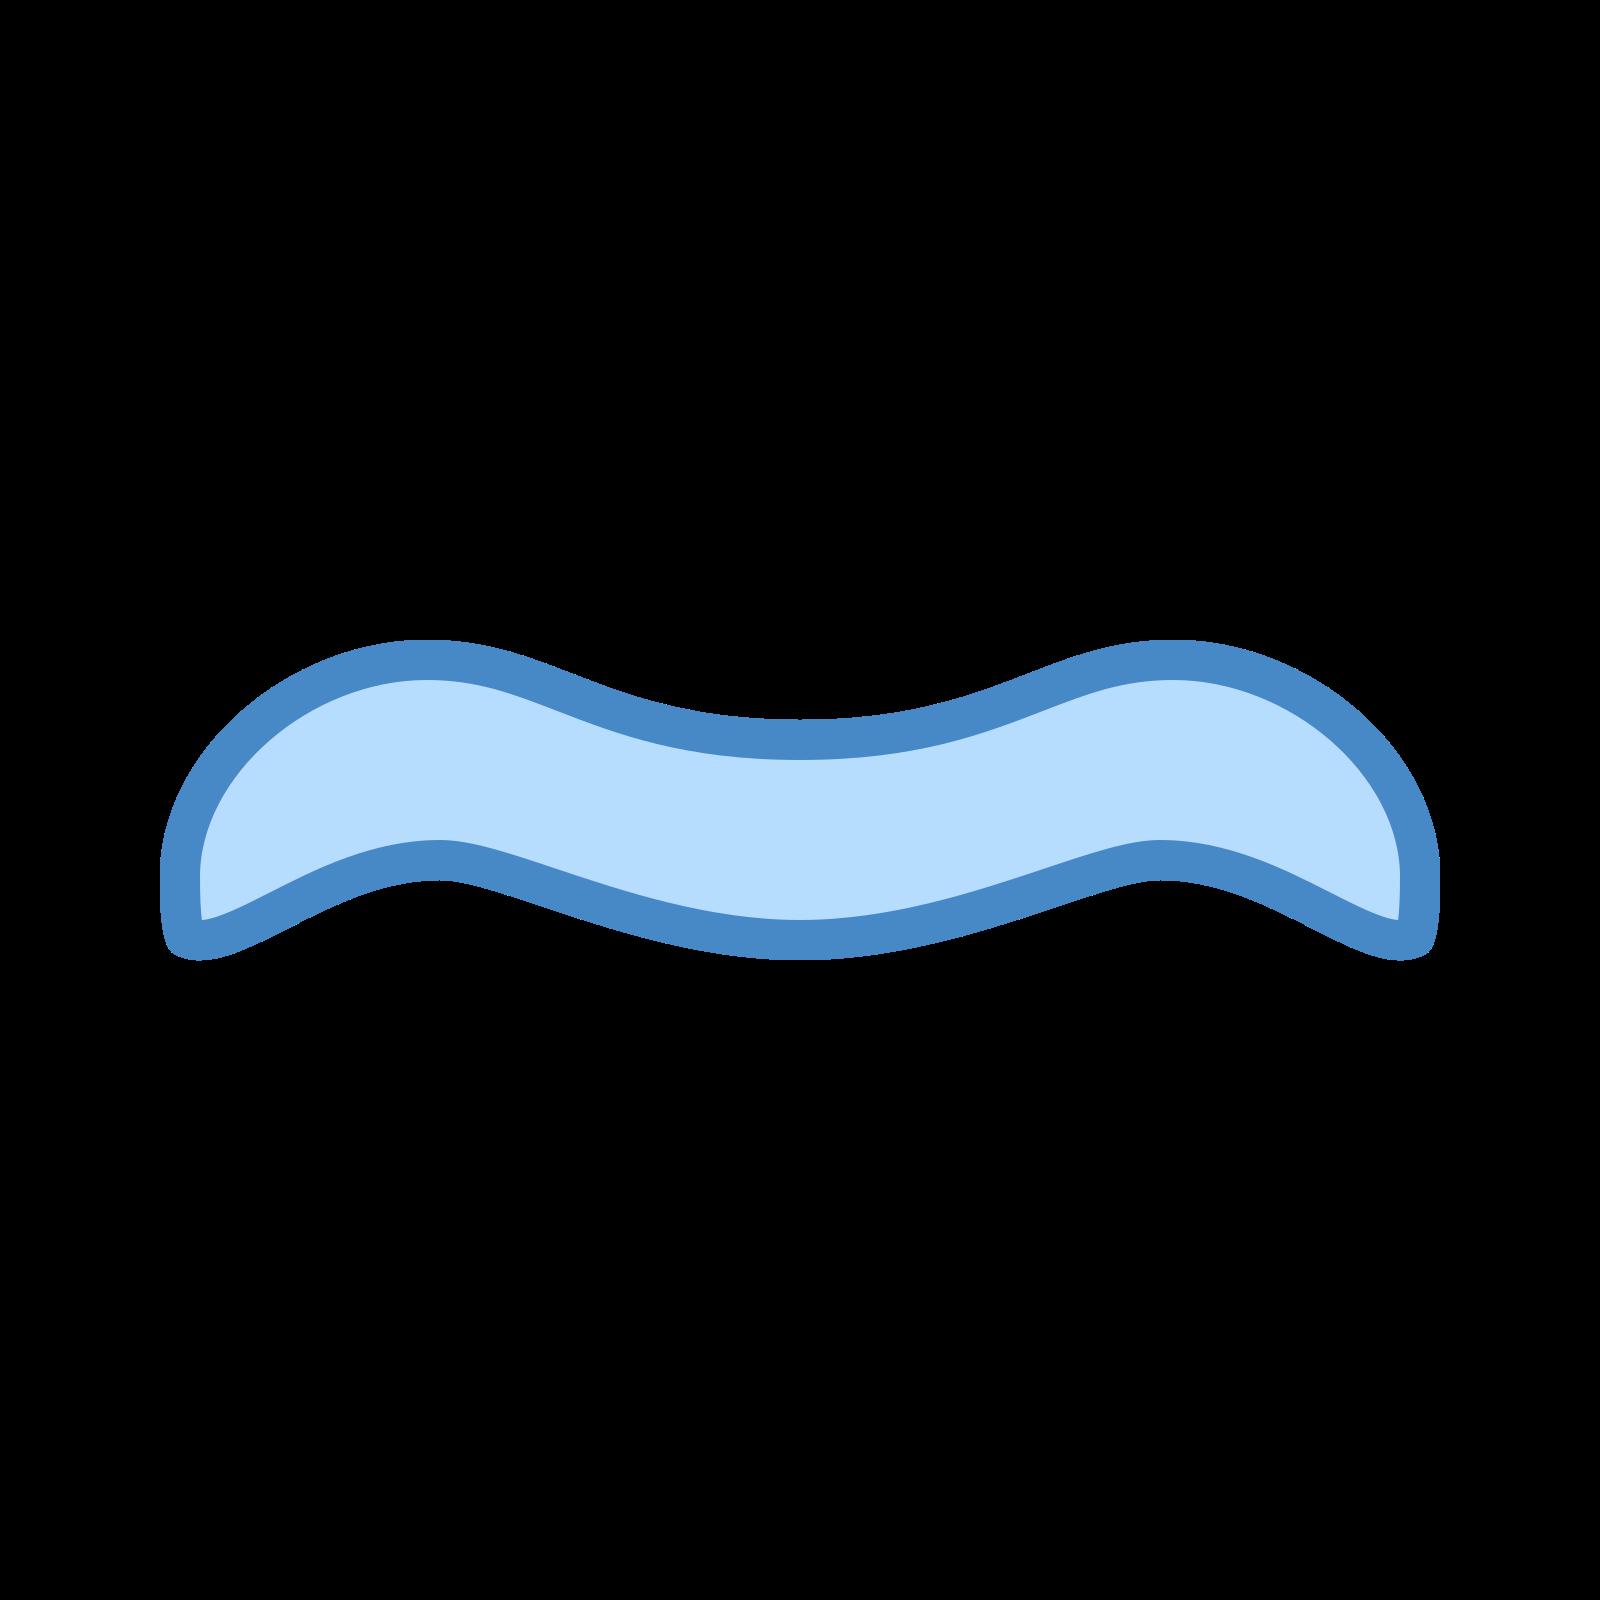 wąsy Ghandhiego icon